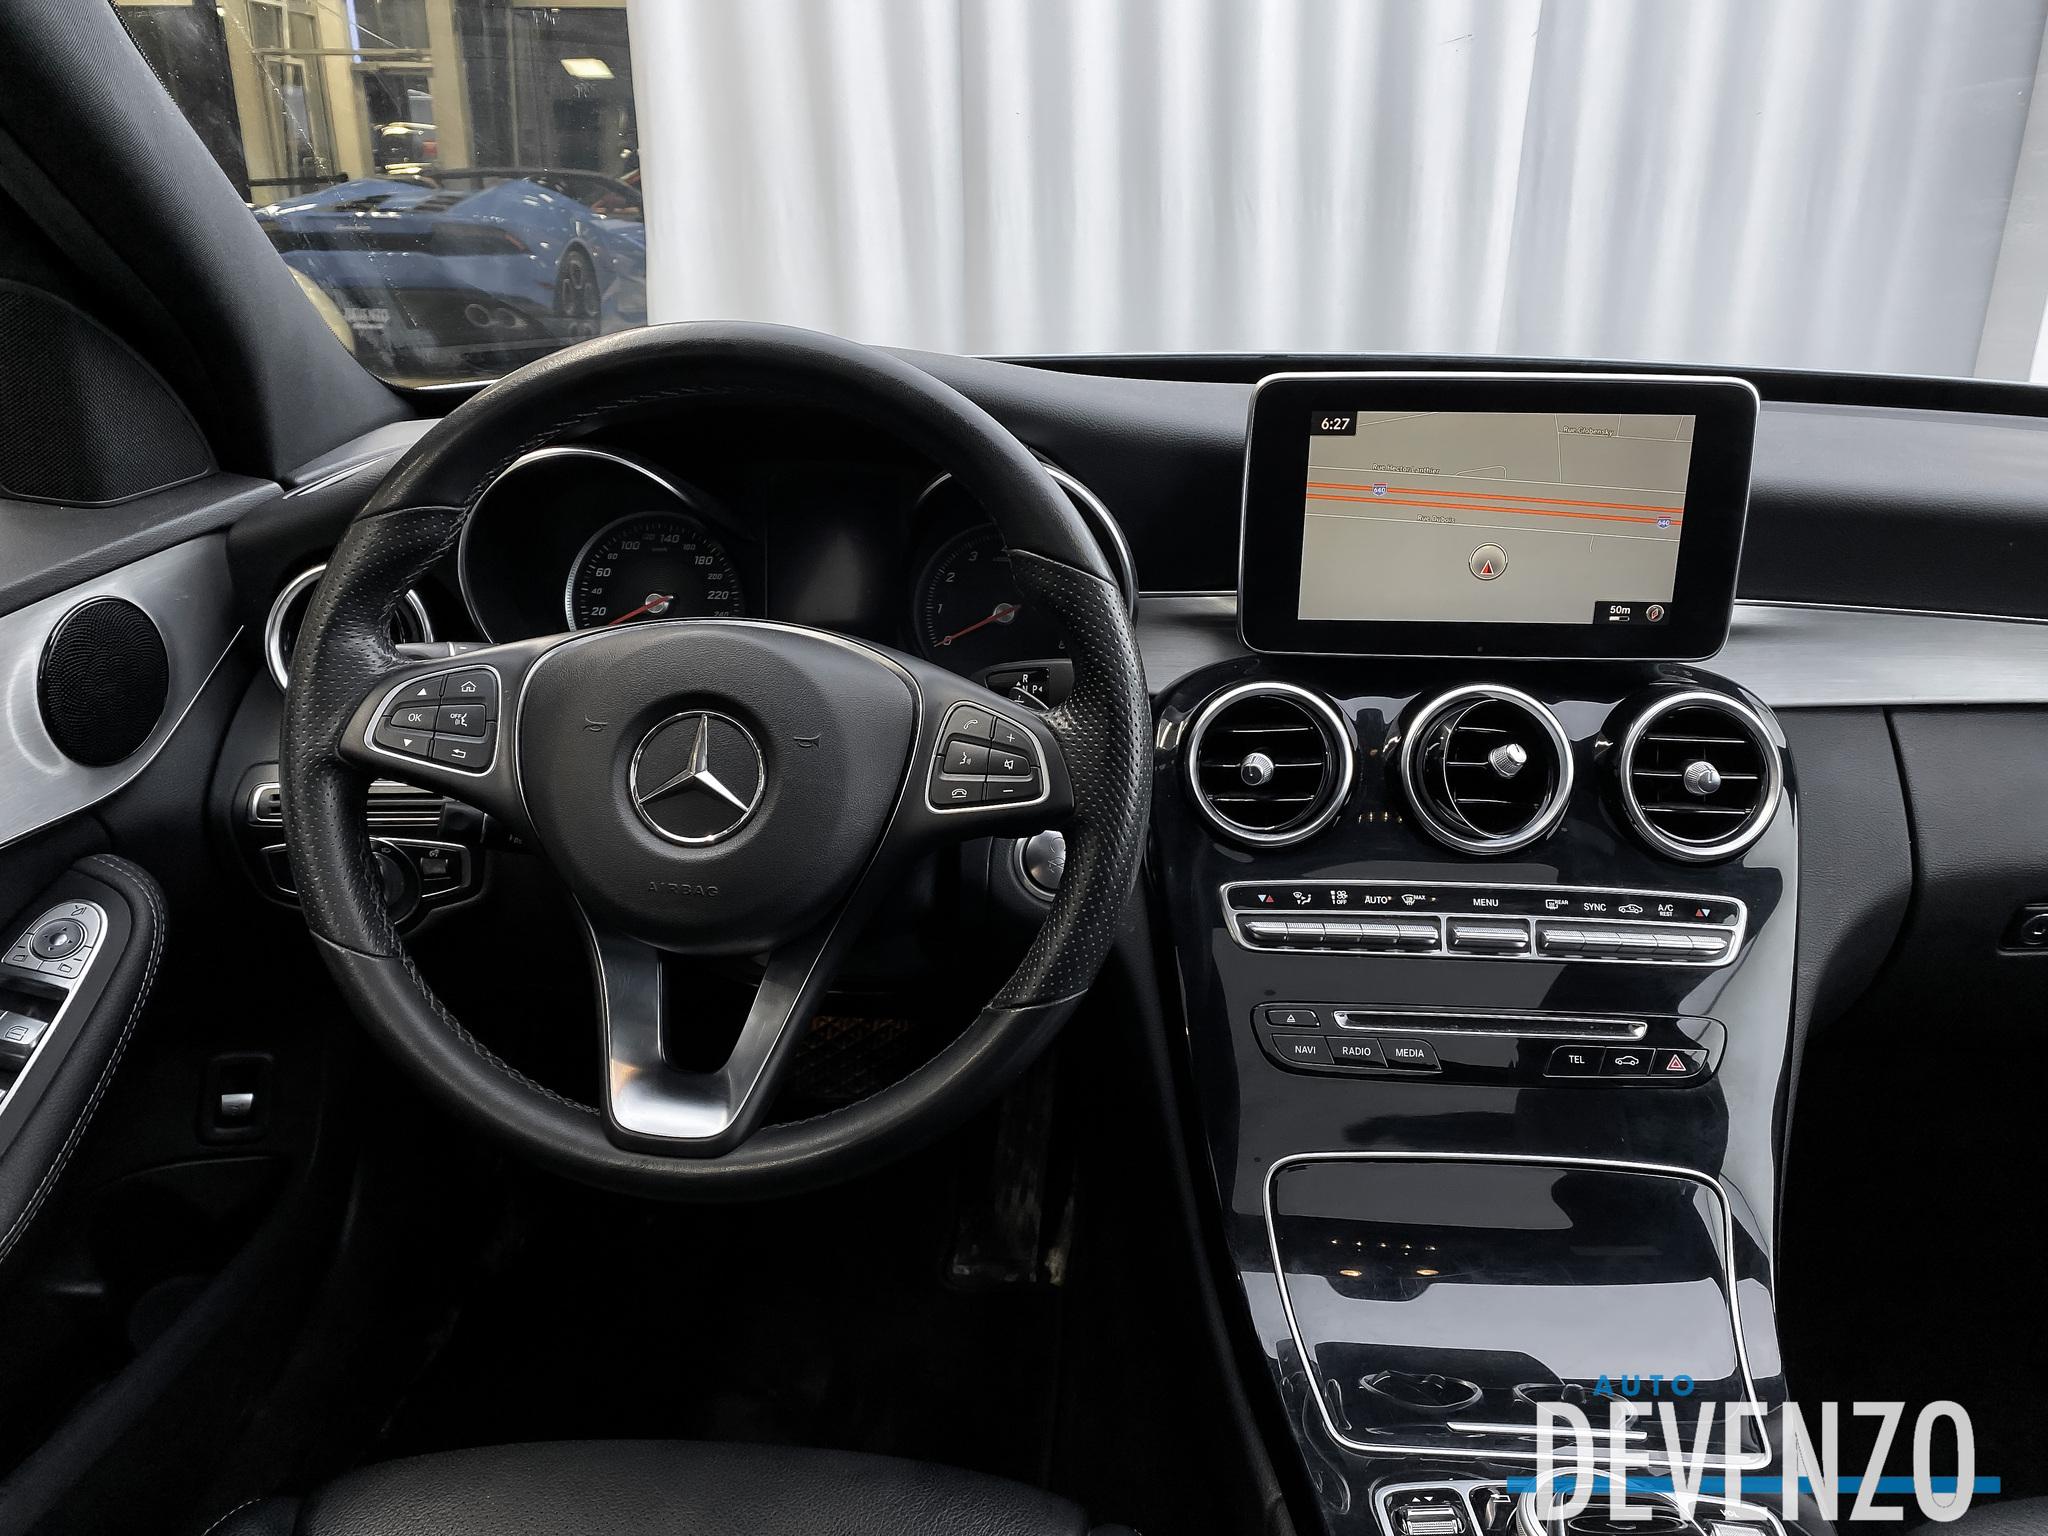 2017 Mercedes-Benz C-Class C300 4MATIC TOIT PANO / NAVIGATION / CAMERA complet